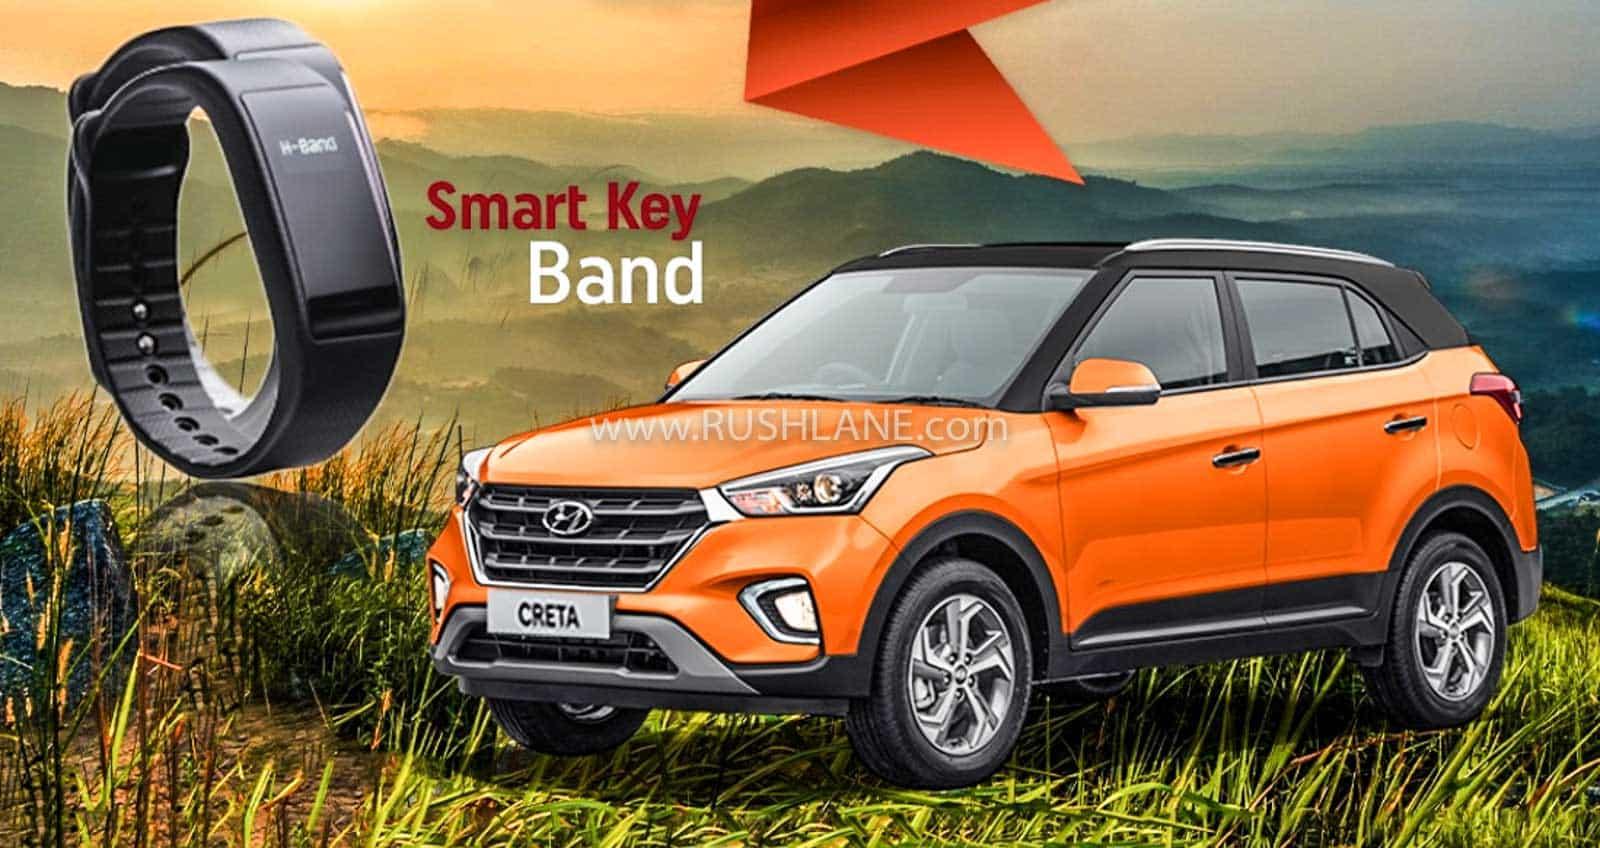 Hyundai Smart Key Band